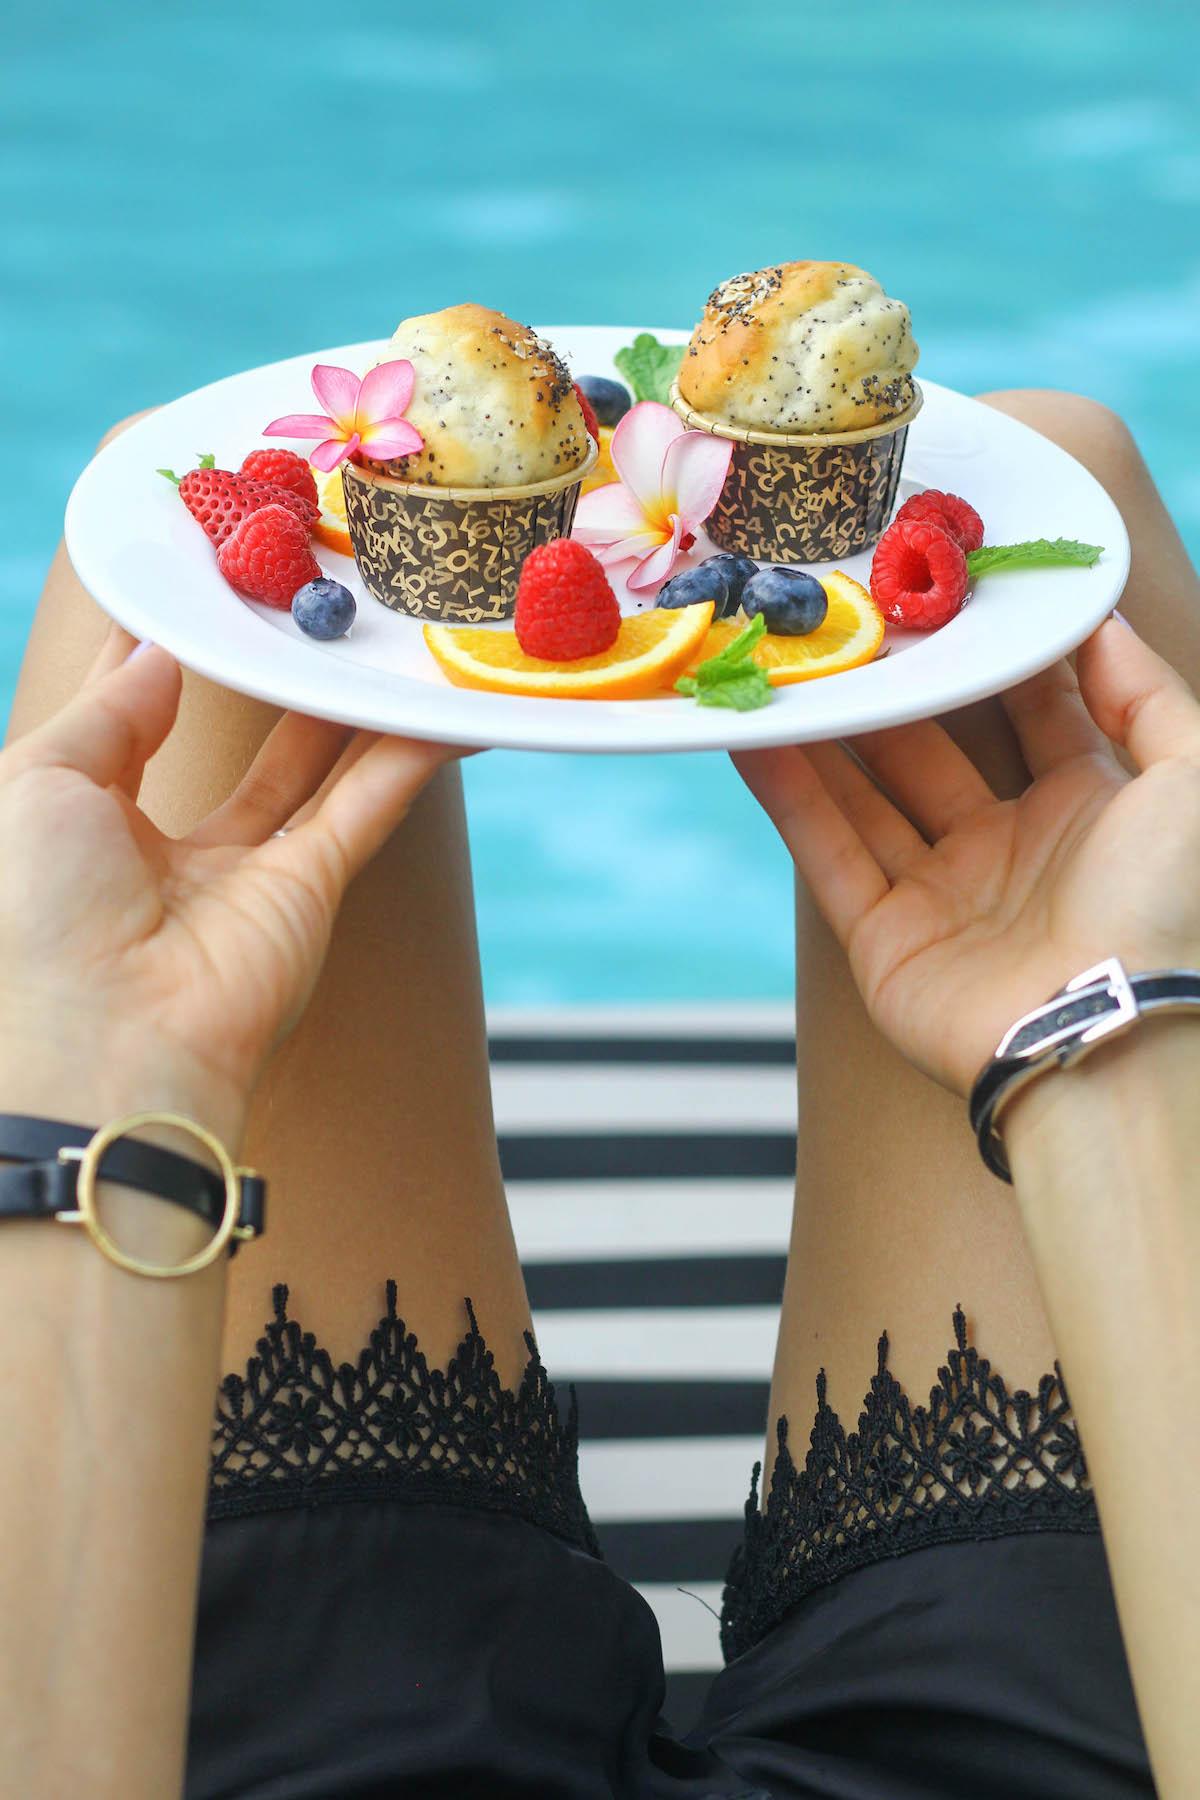 Gluten Free Muffins at Grand Hyatt Erawan. A Gluten Free Luxury Hotel in Bangkok copy